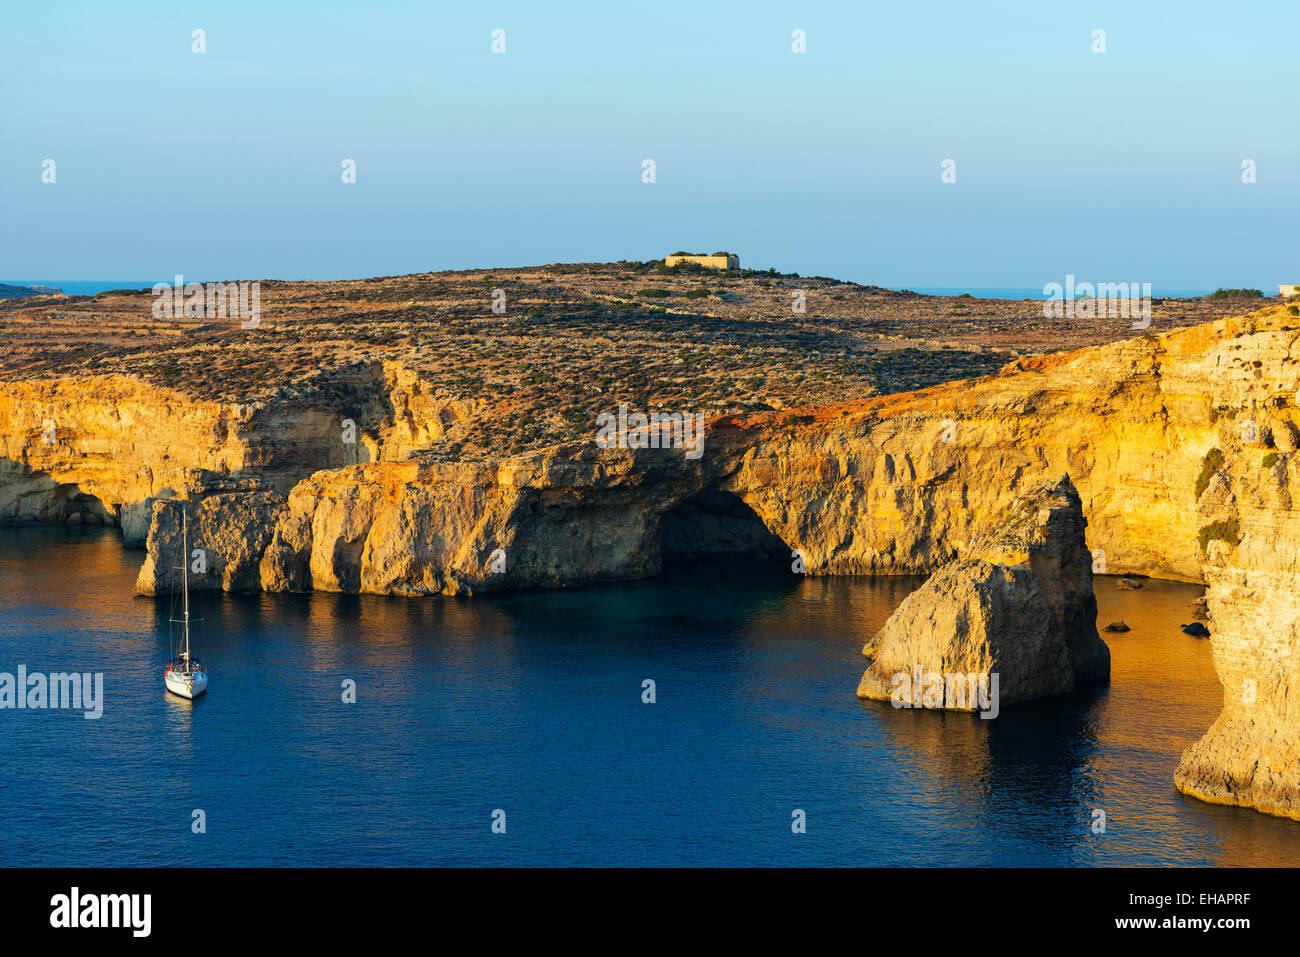 Mittelmeer Europa, Malta, Insel Comino, Stockbild